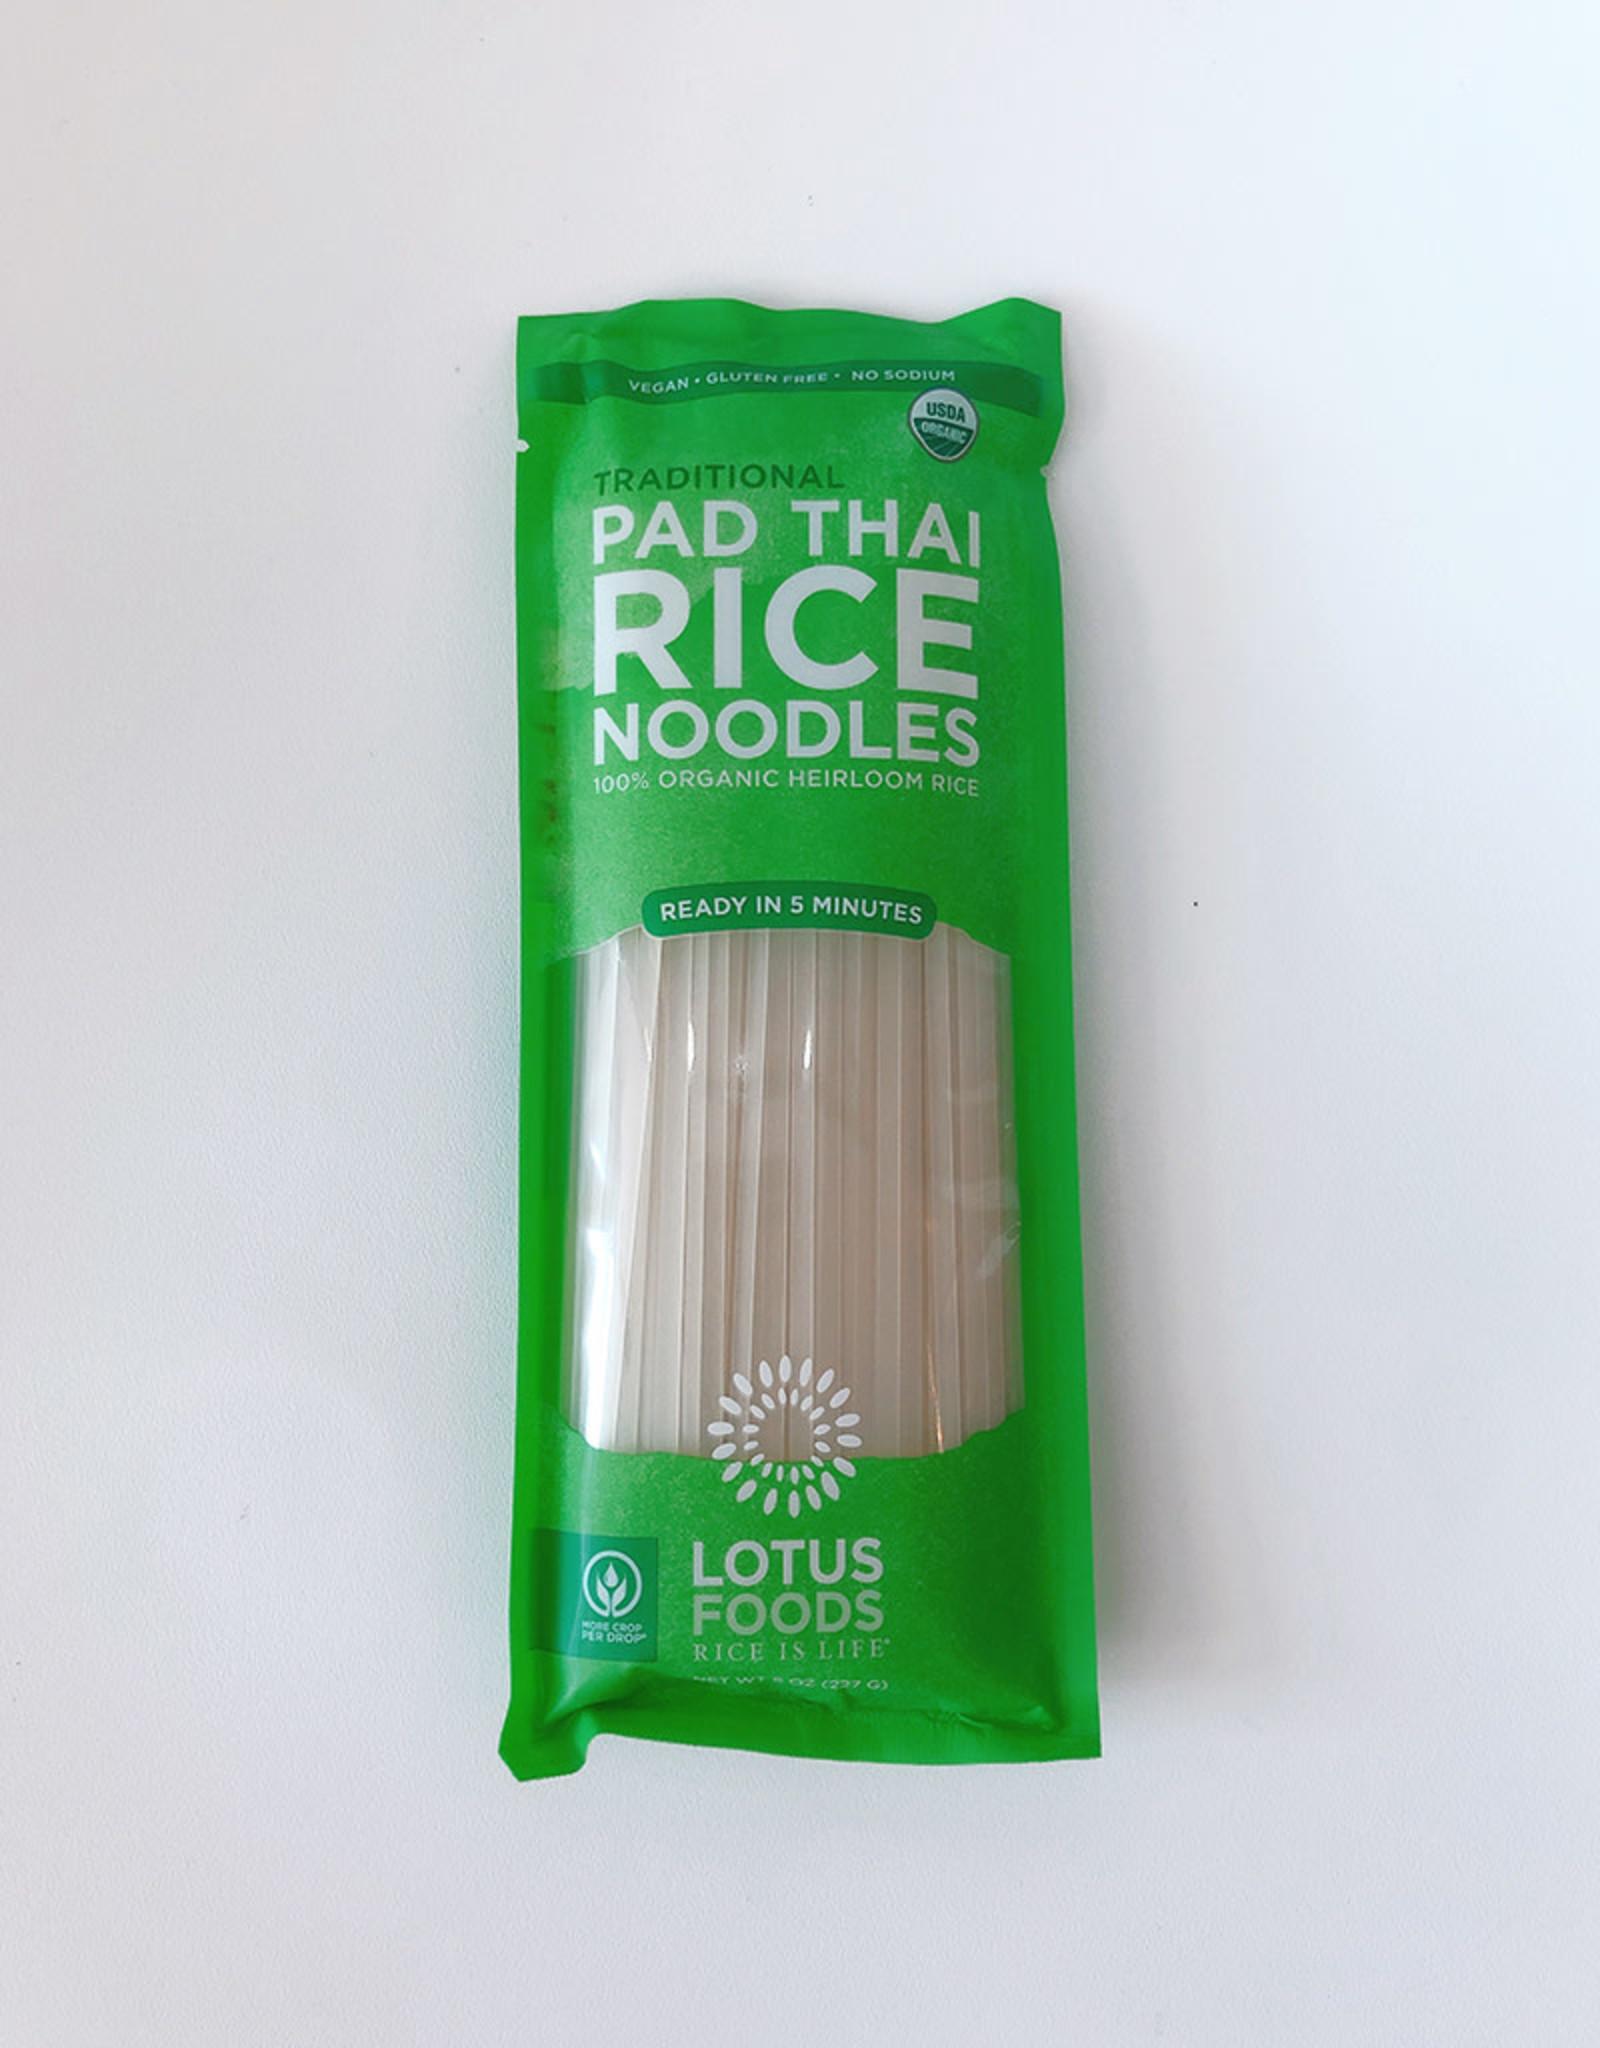 Lotus Foods Lotus Foods - Pad Thai Rice Noodles, Traditional Heirloom